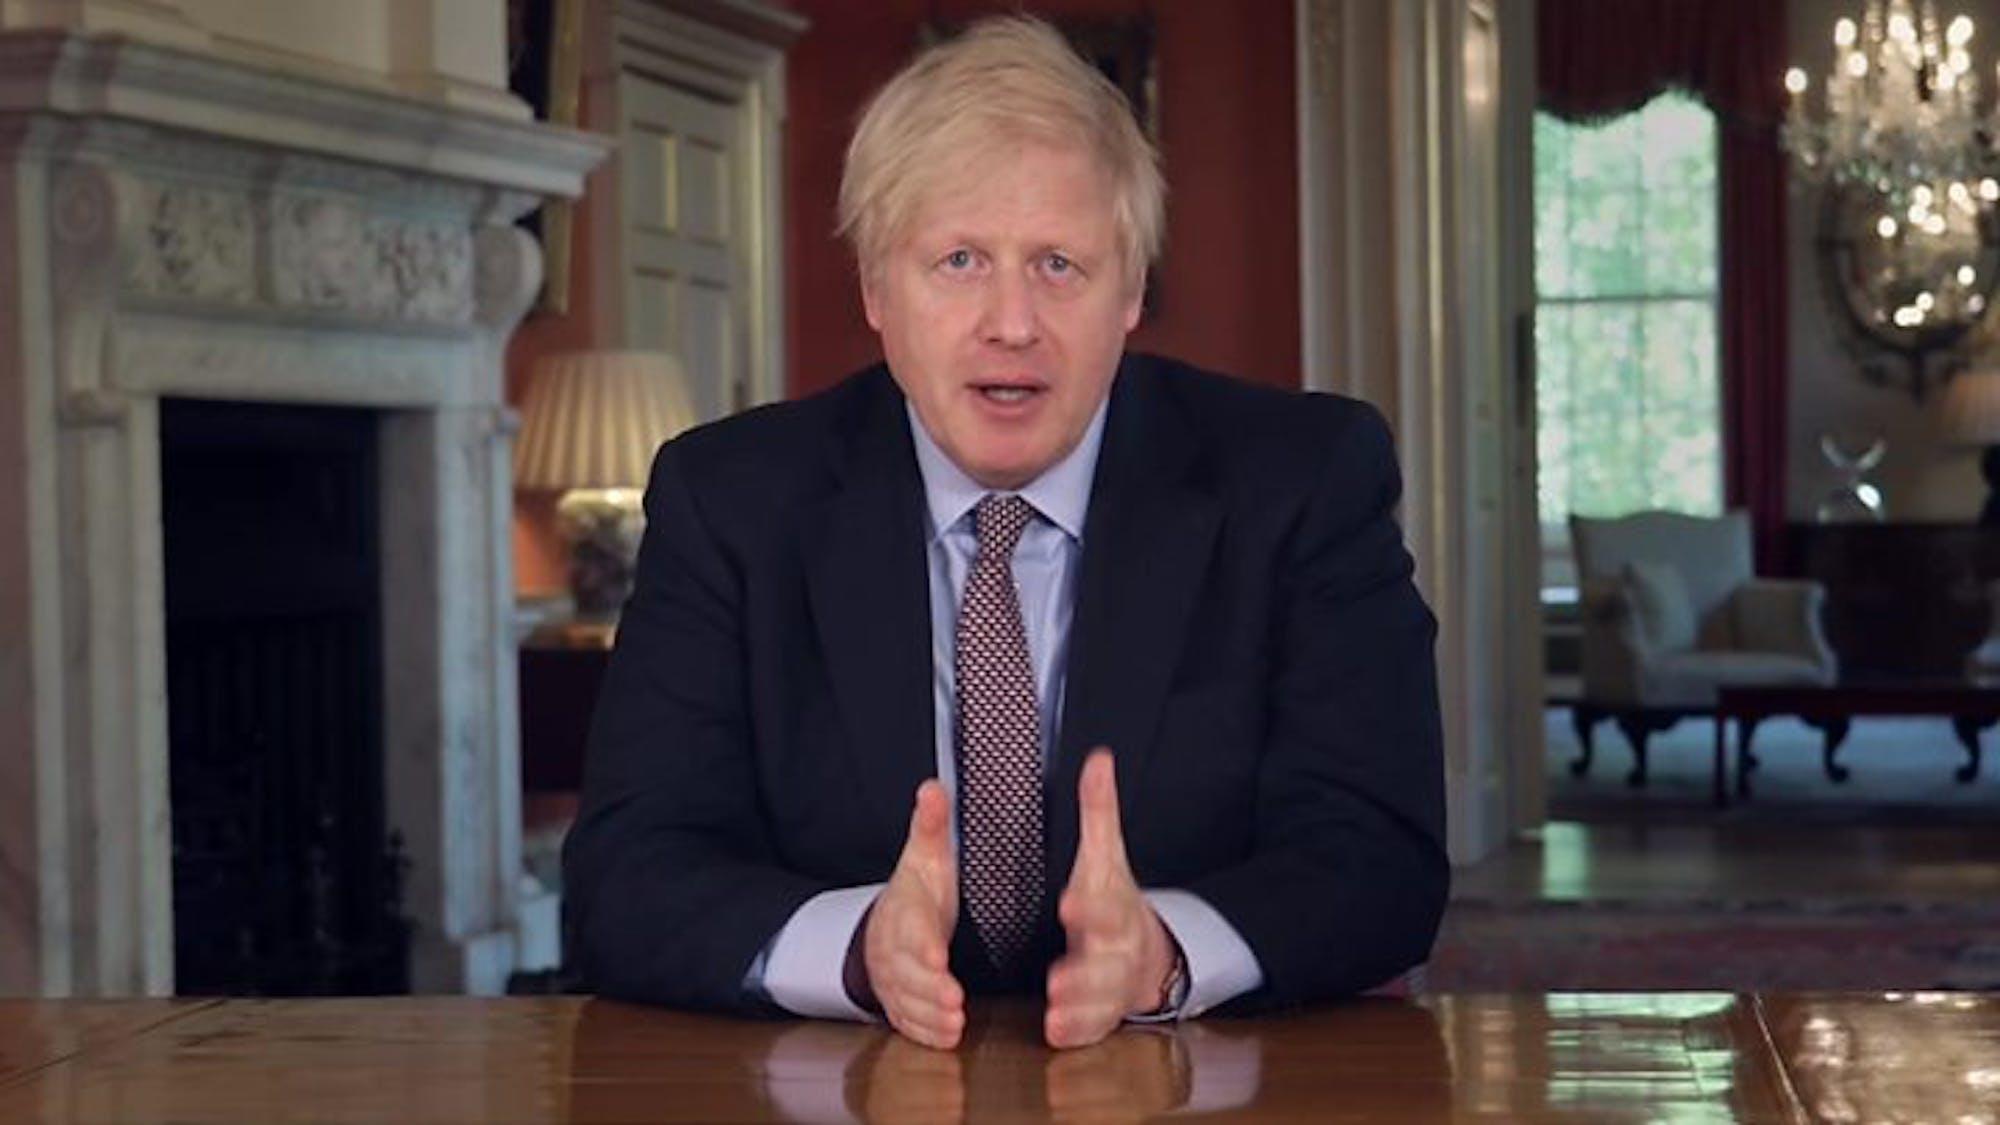 Door pushes cautiously ajar for Britain's luxury lockdown